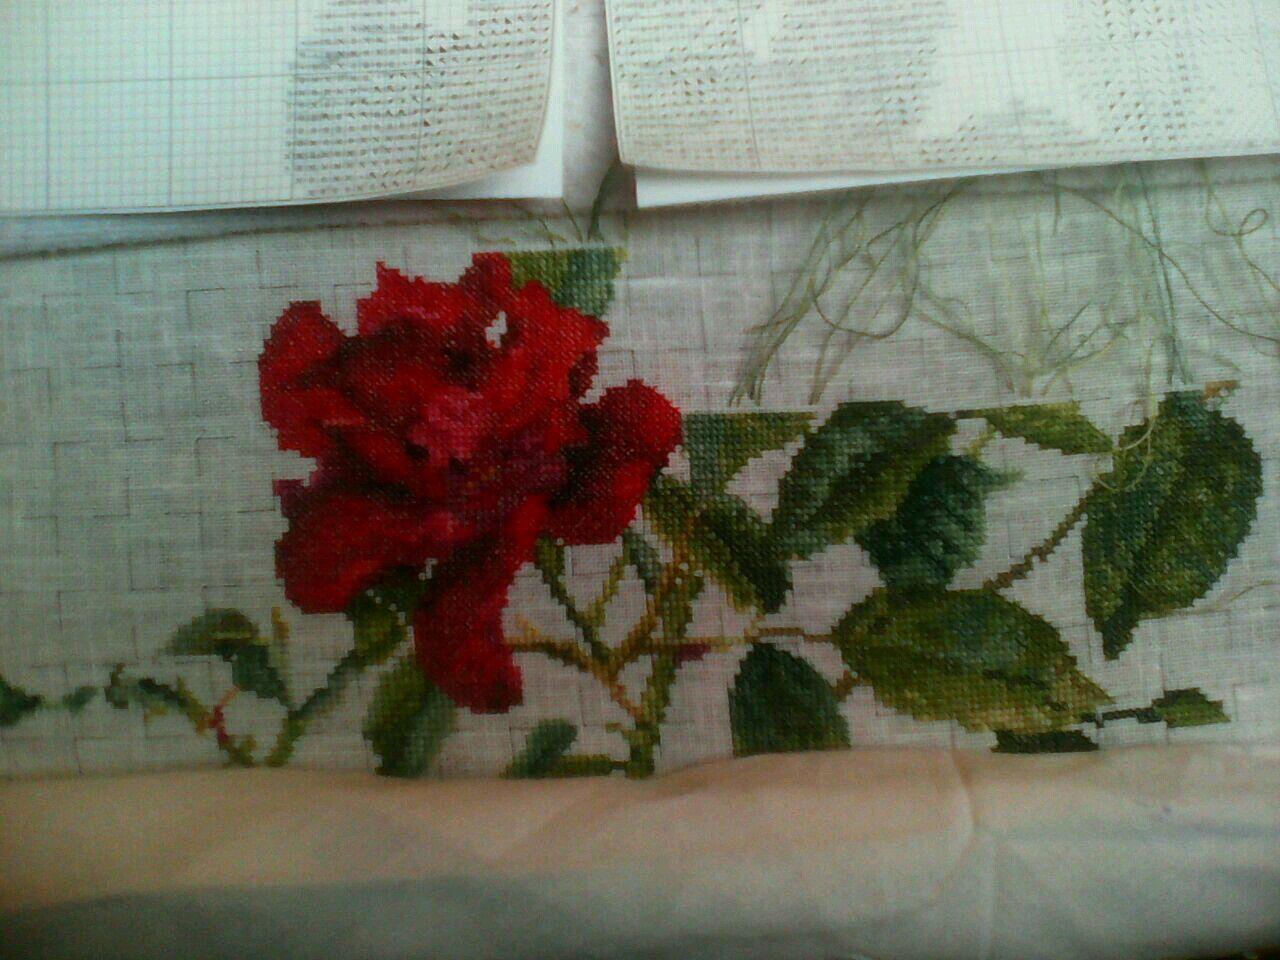 embro розы работы ручной роза handmade вышитые красный embroidery вышивка ручная ярко art